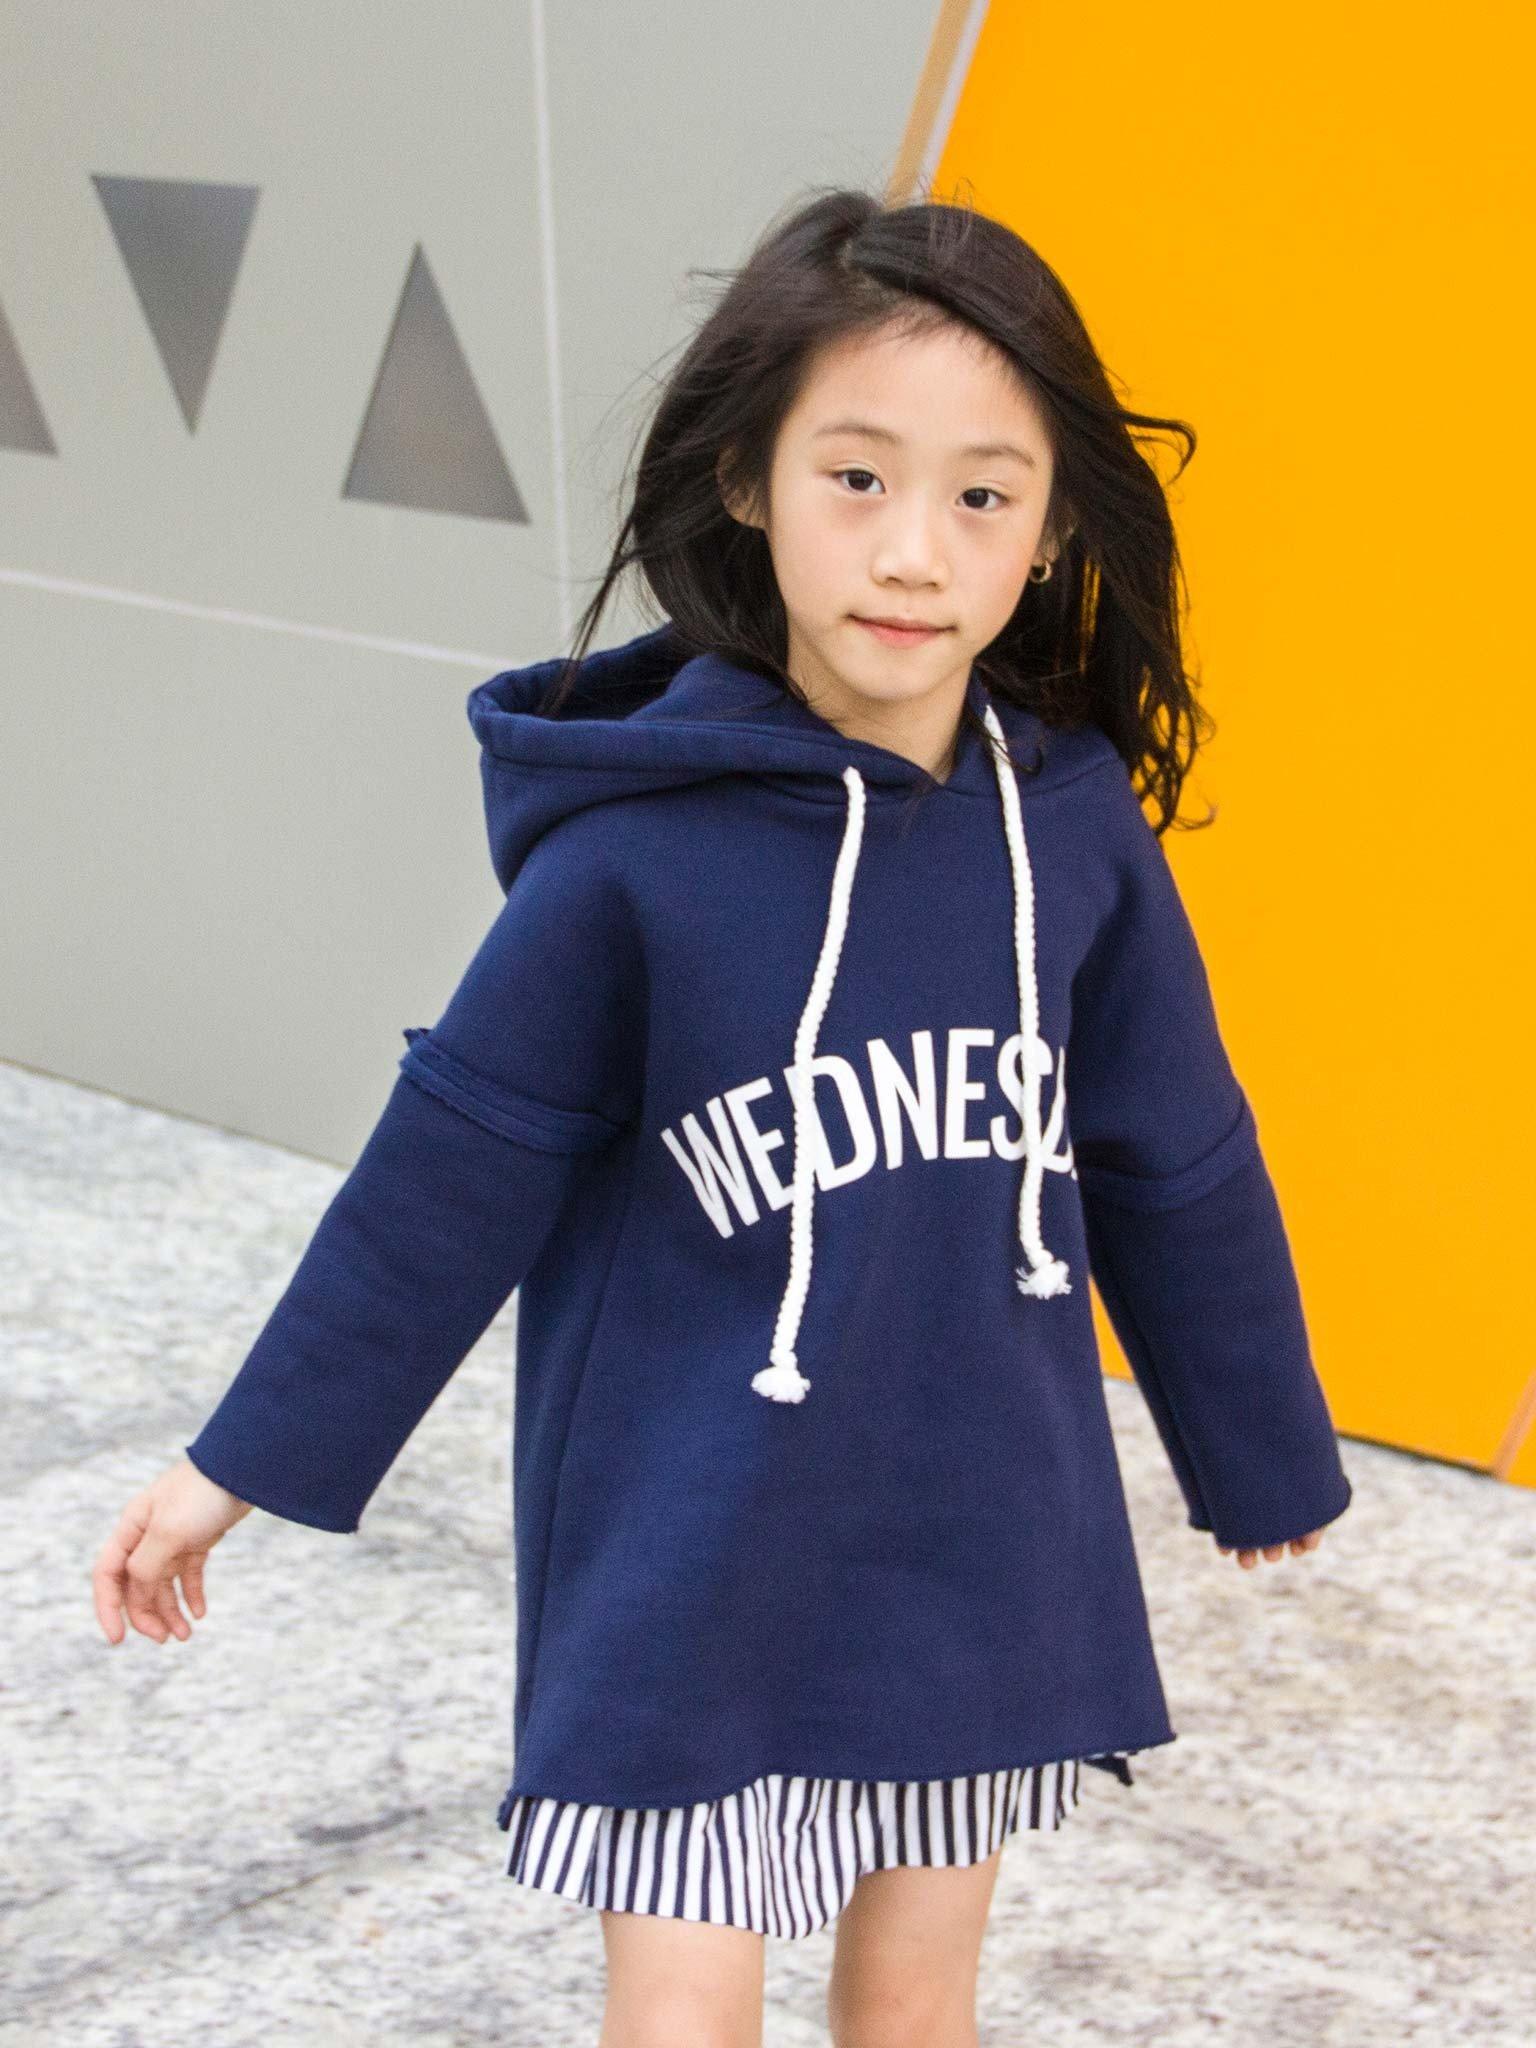 Áo nỉ bé gái màu navy, in chữ WEDNESDAY - Blueseven